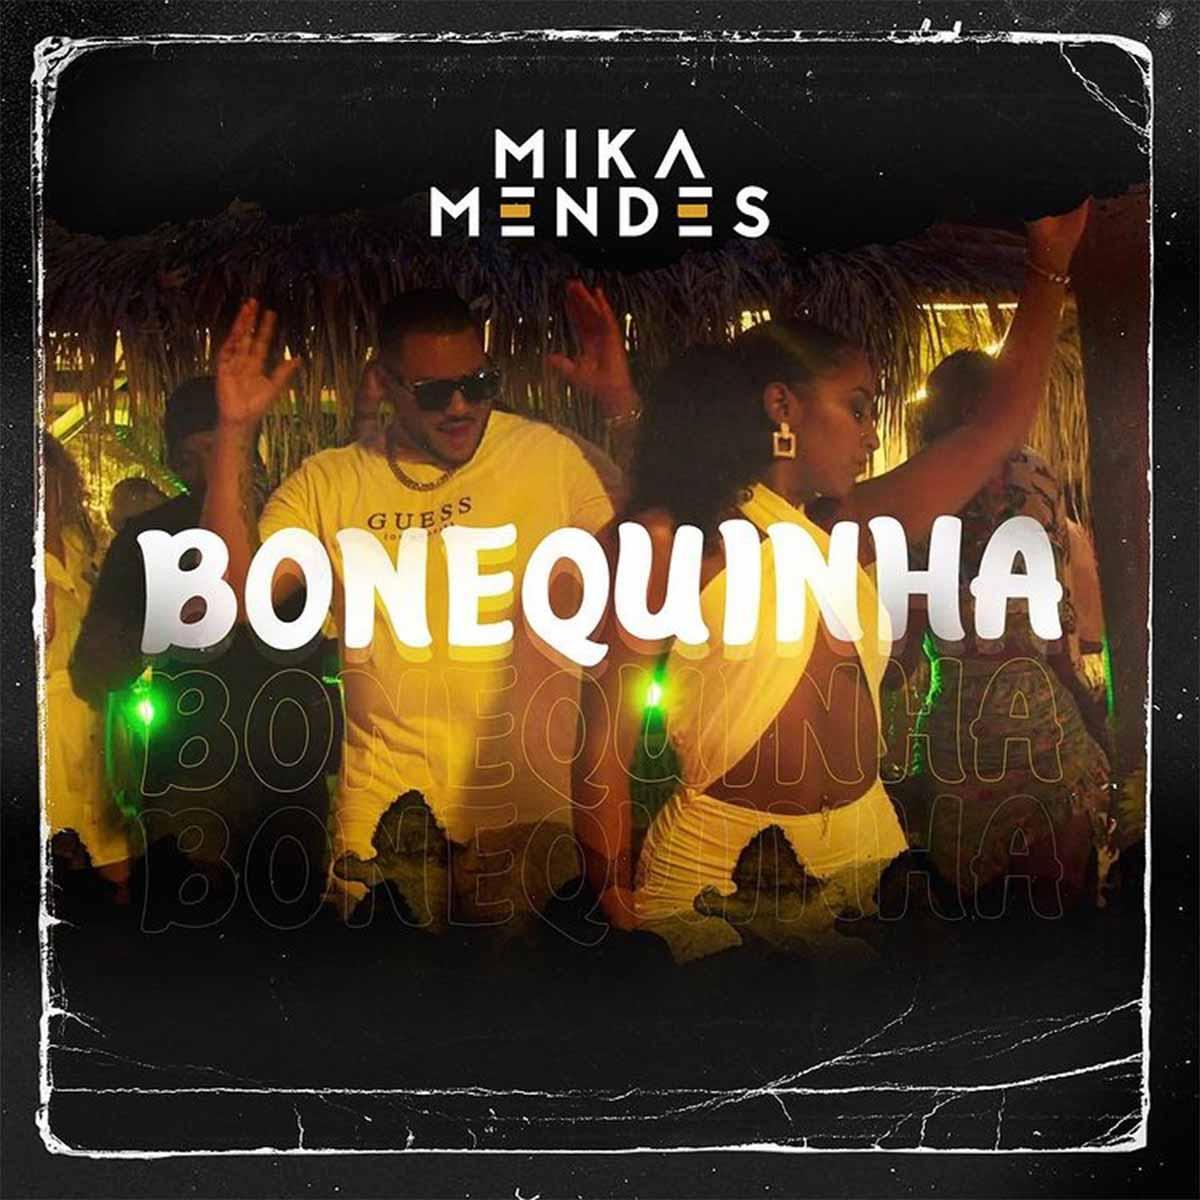 Mika Mendes - Bonequinha